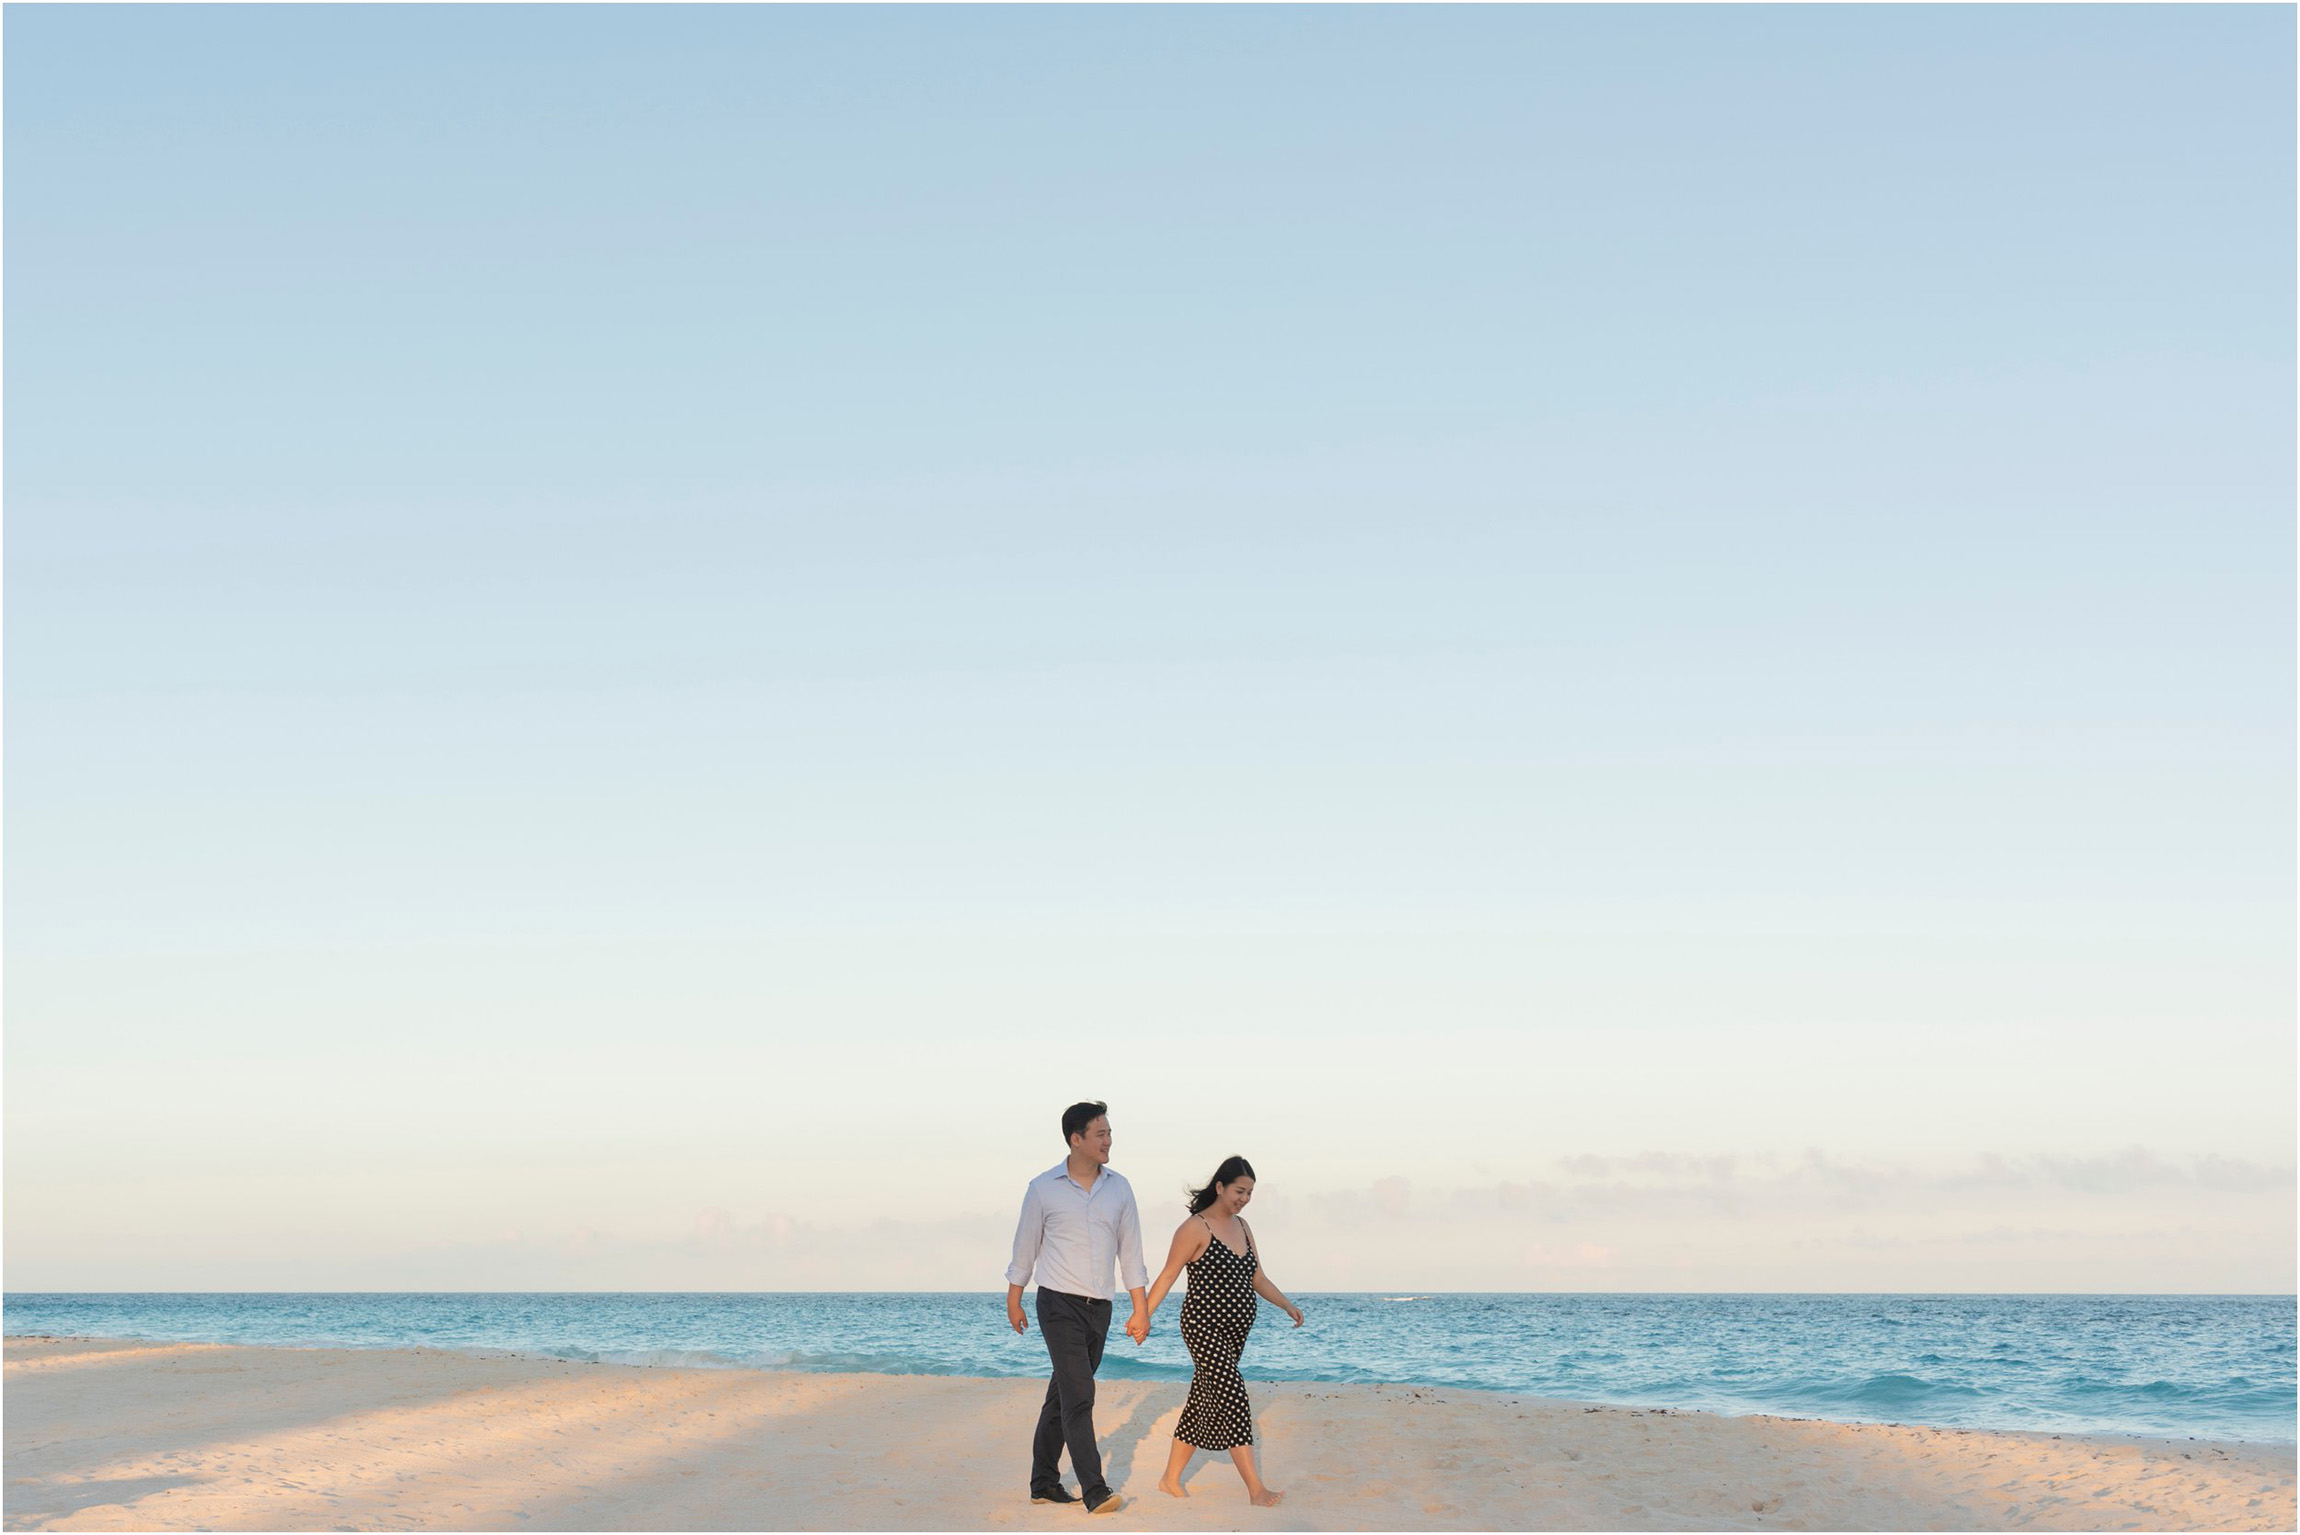 ©FianderFoto_Bermuda_Maternity_Photographer_Tuckers Point_Bermuda_015.jpg